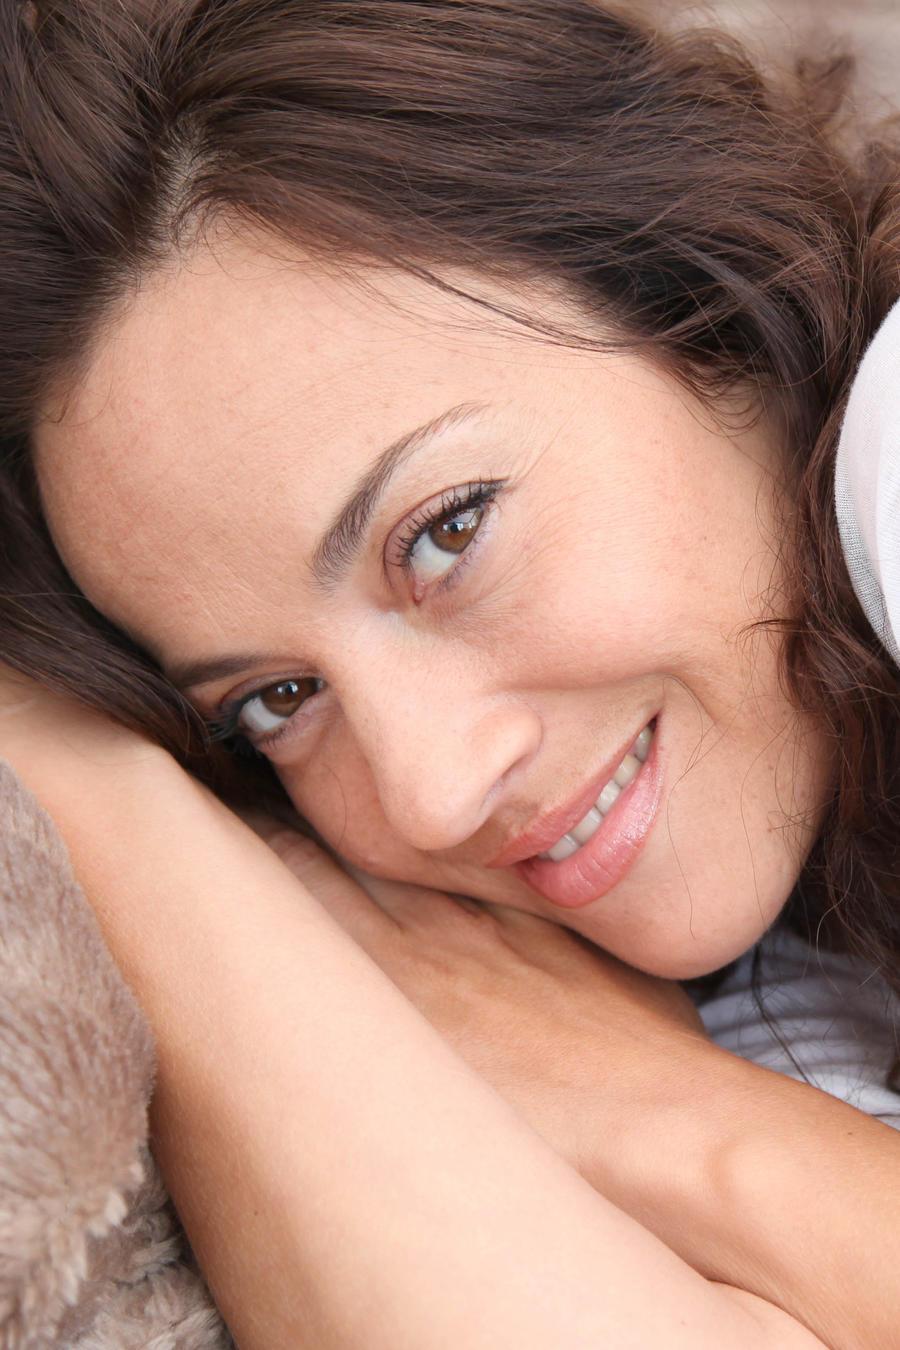 Mujer recostada sonriendo